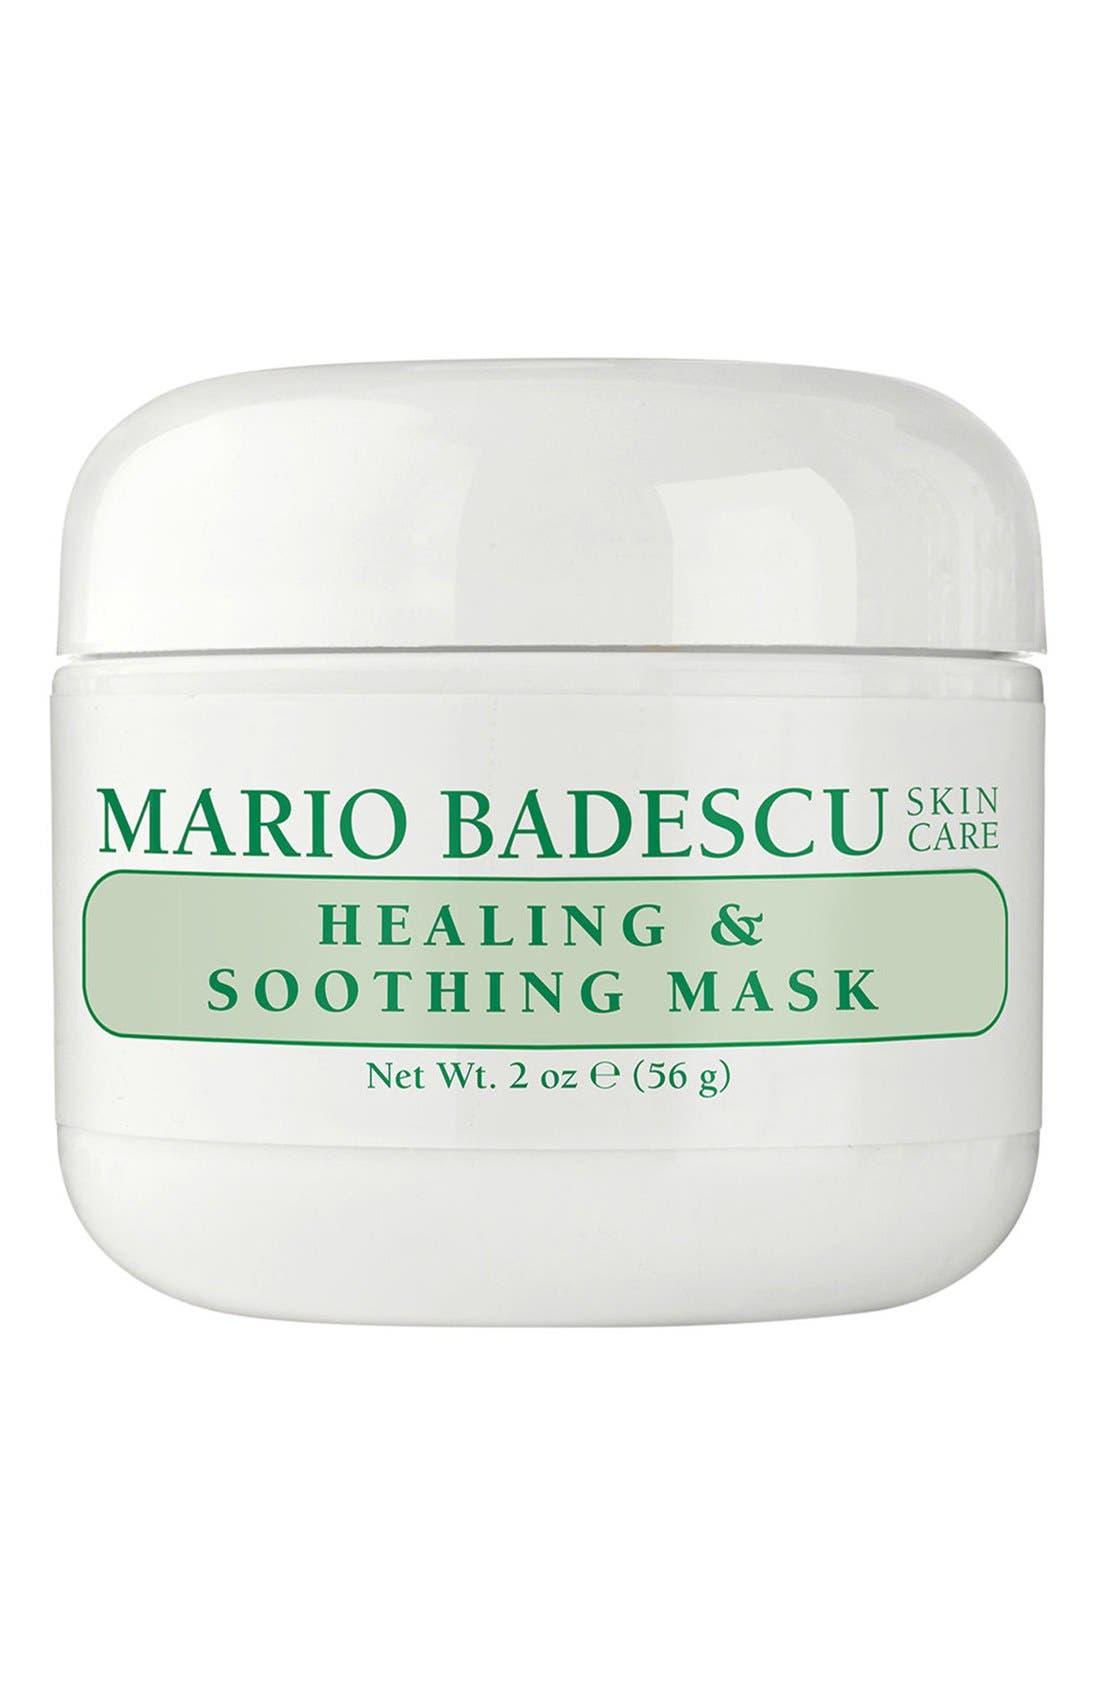 Mario Badescu Healing & Soothing Mask